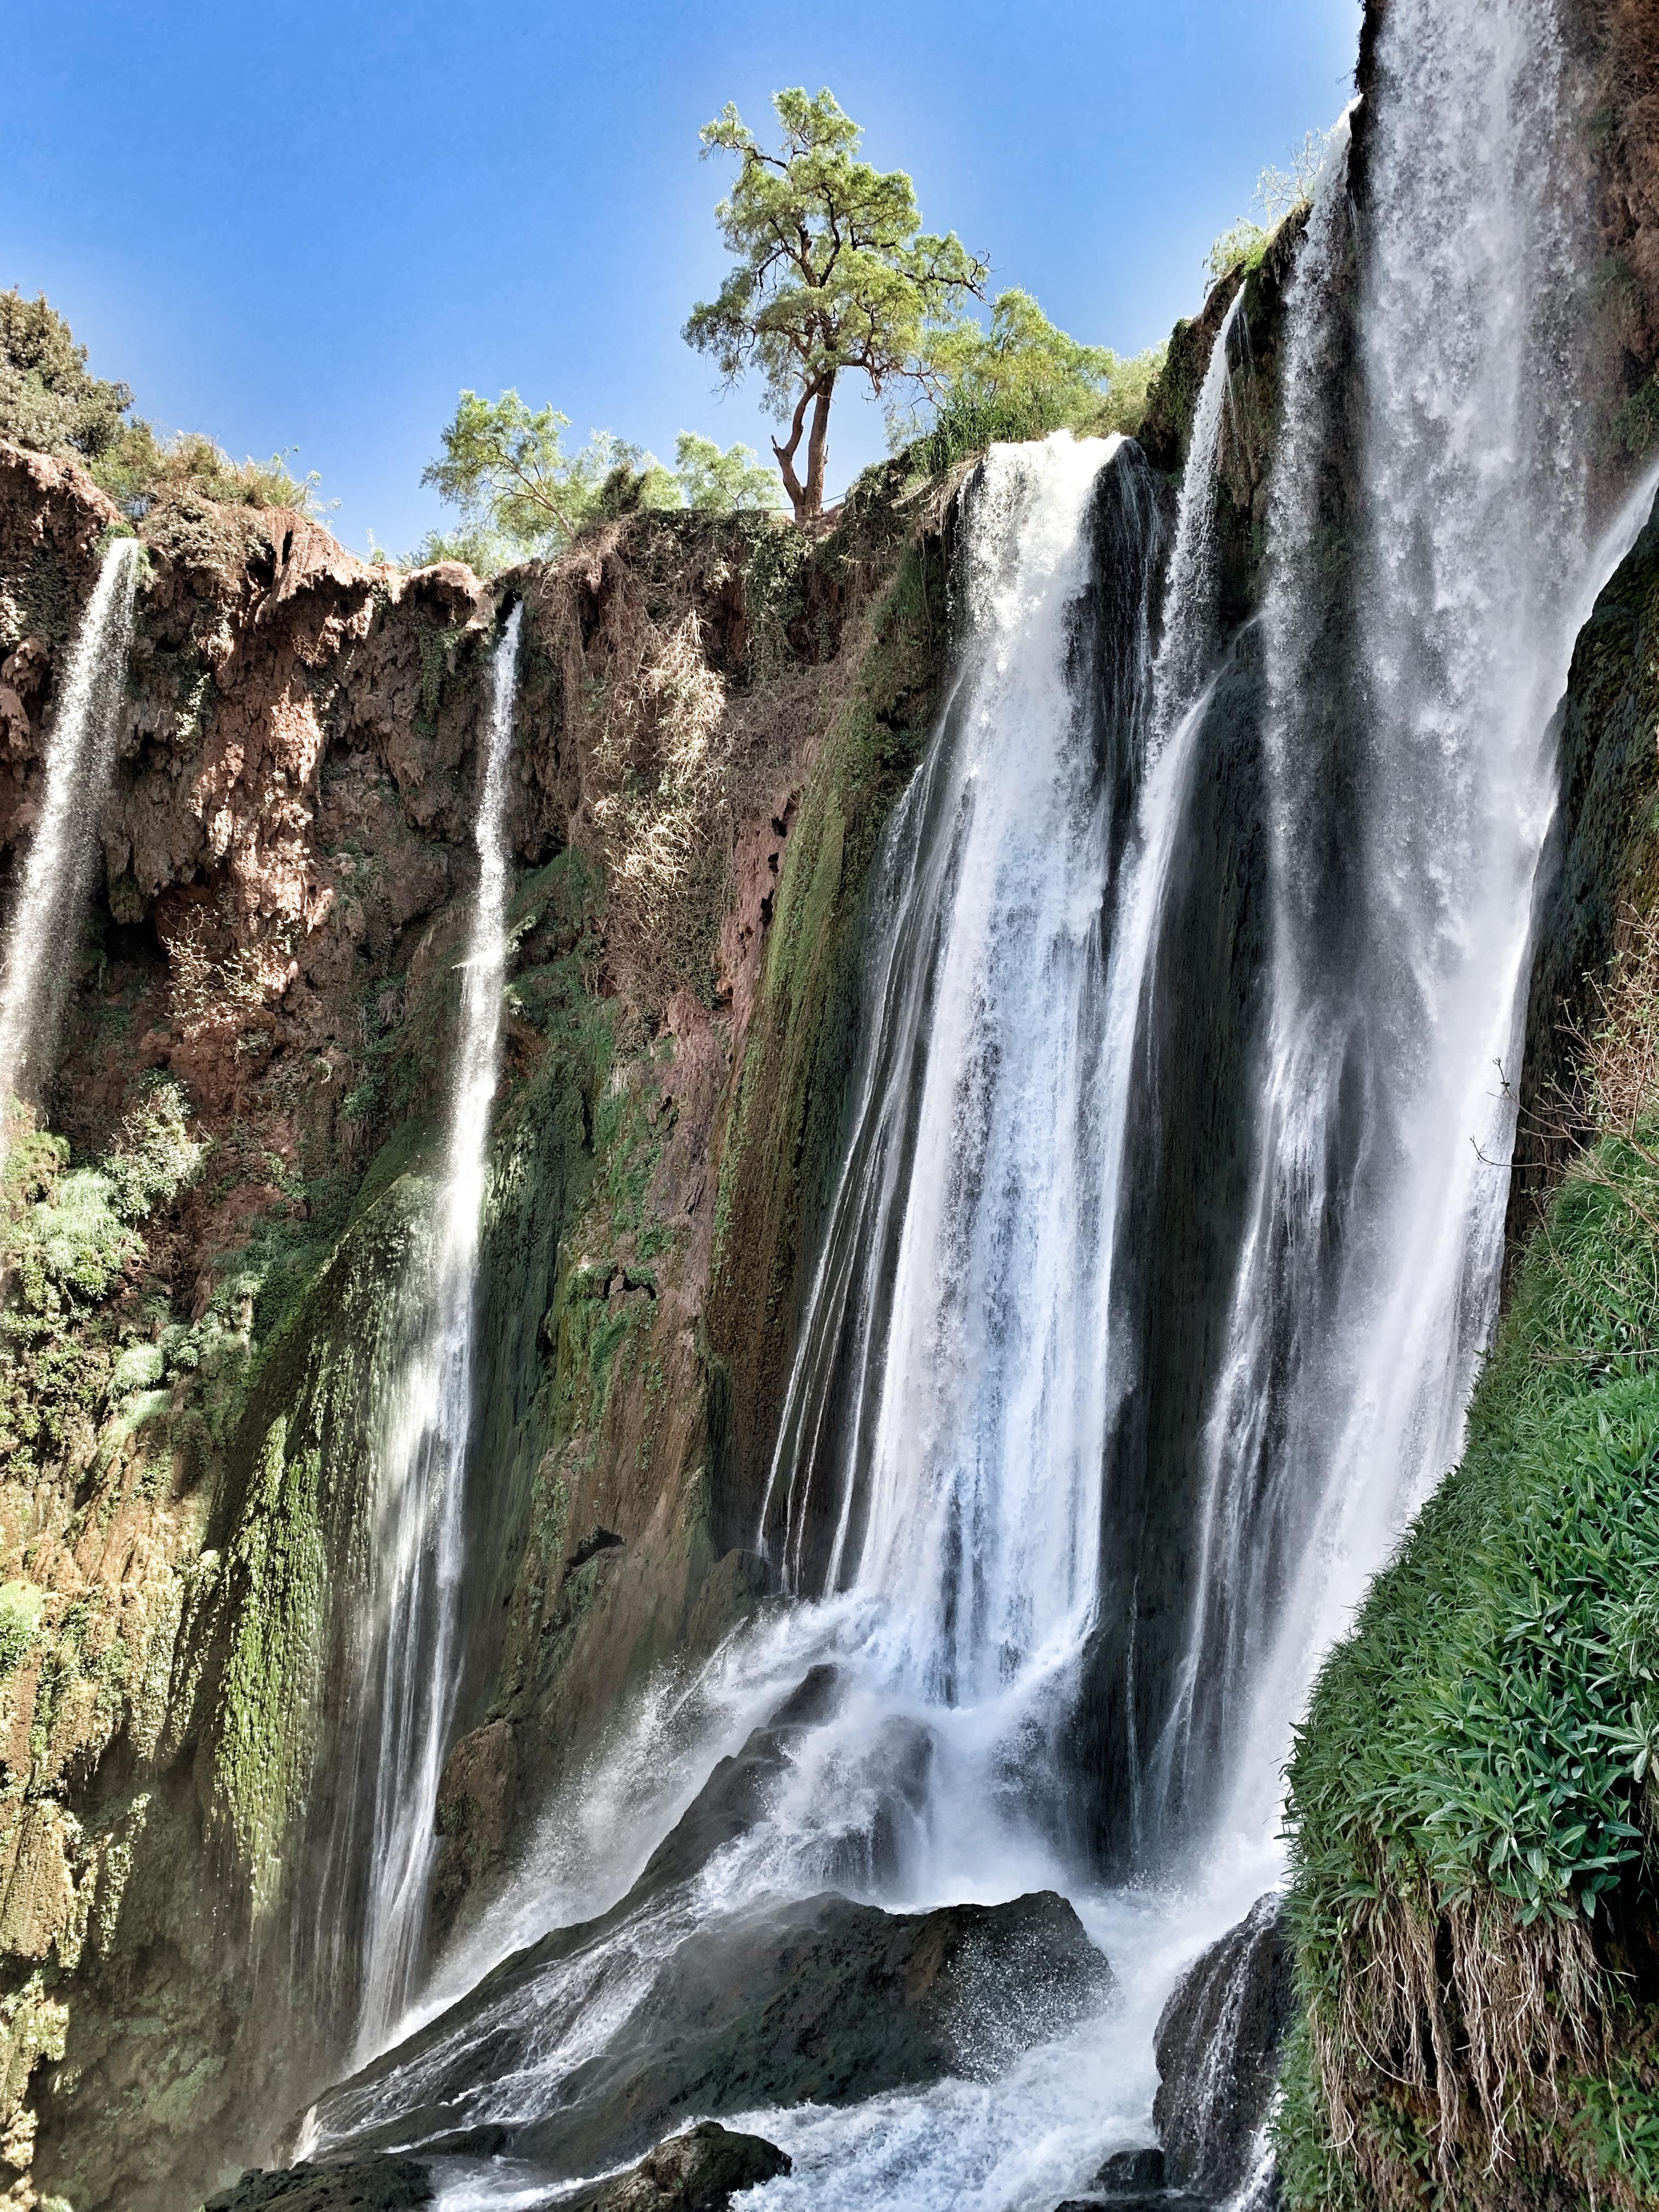 Tagestour nach Ouzoud zum Wasserfall